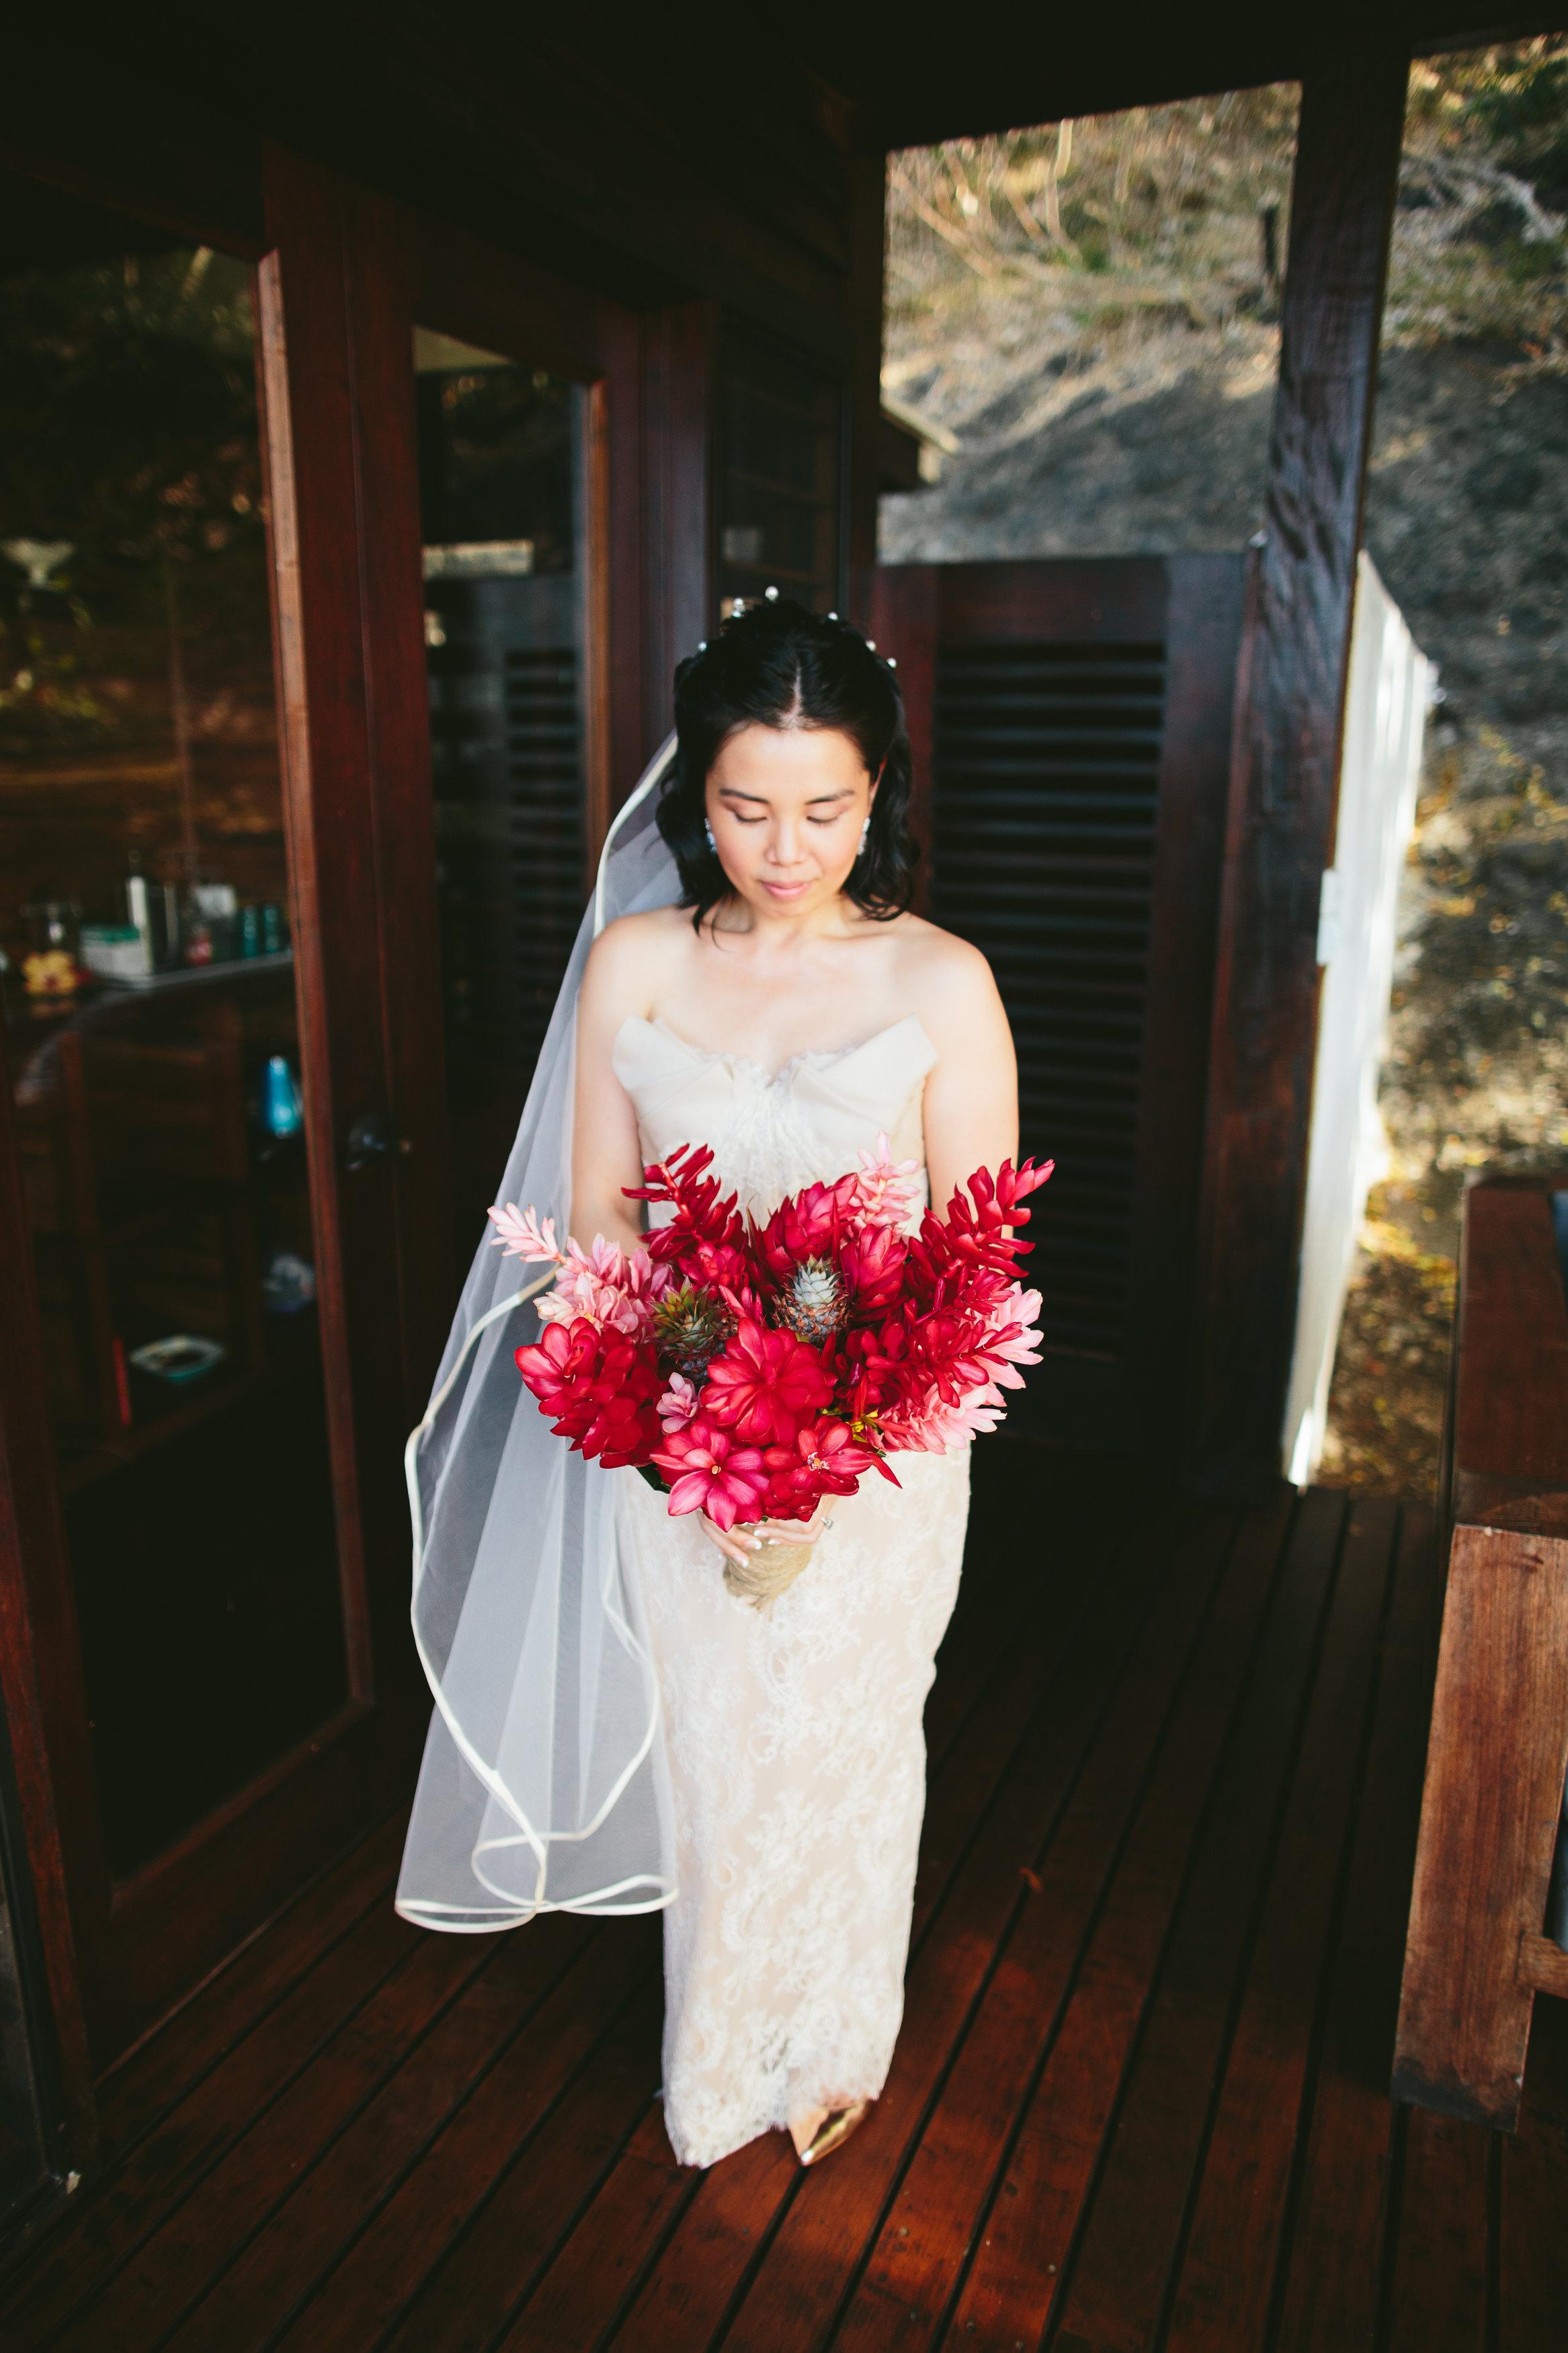 Red Ginger Bouquet - Fiji Wedding Elopement - The Remote Resort Fiji Islands